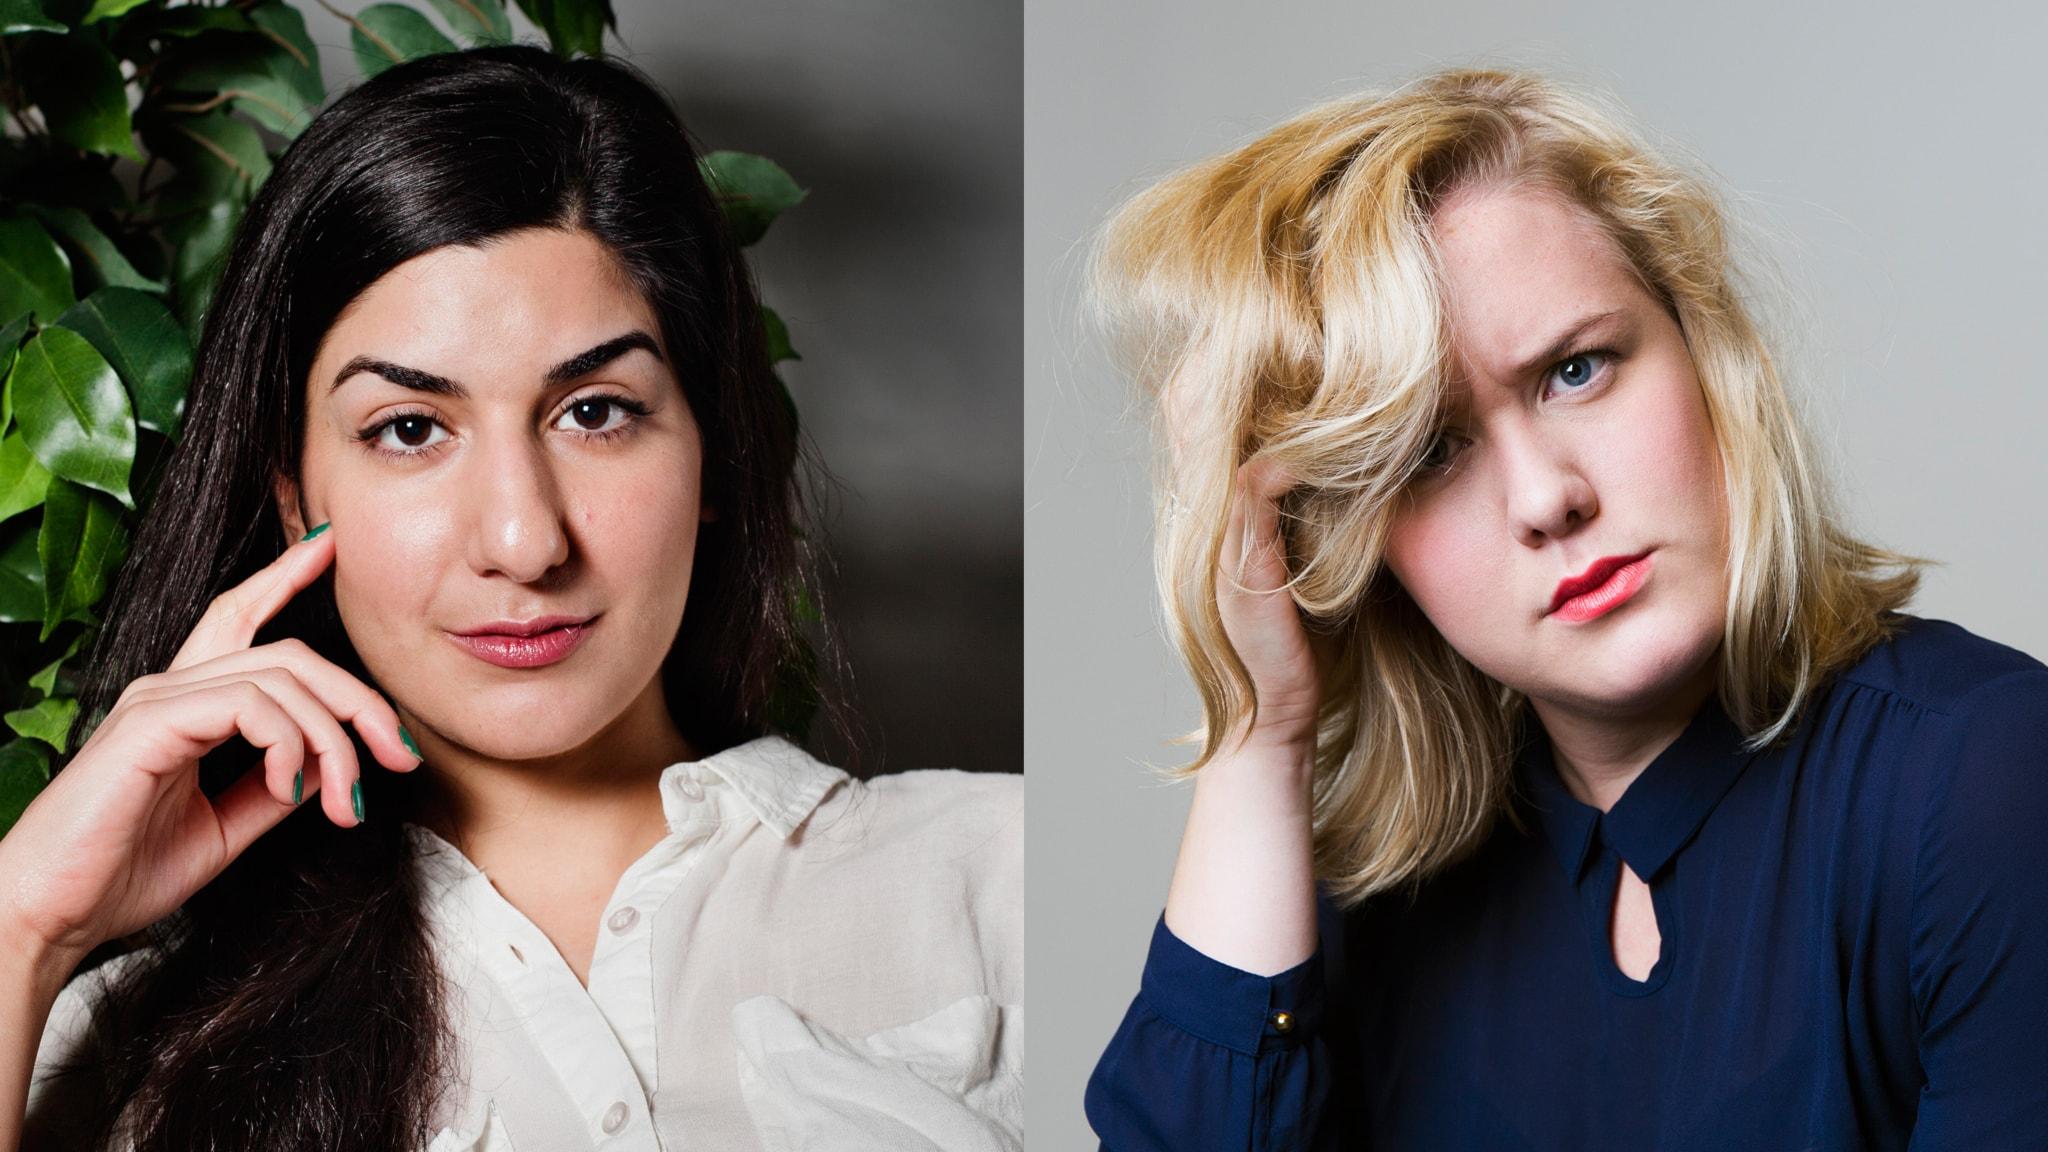 Dilan Apak. Foto: Julia Lindemalm/Sveriges Radio. Moa Lundqvist. Foto: Mattias Ahlm/Sveriges Radio.